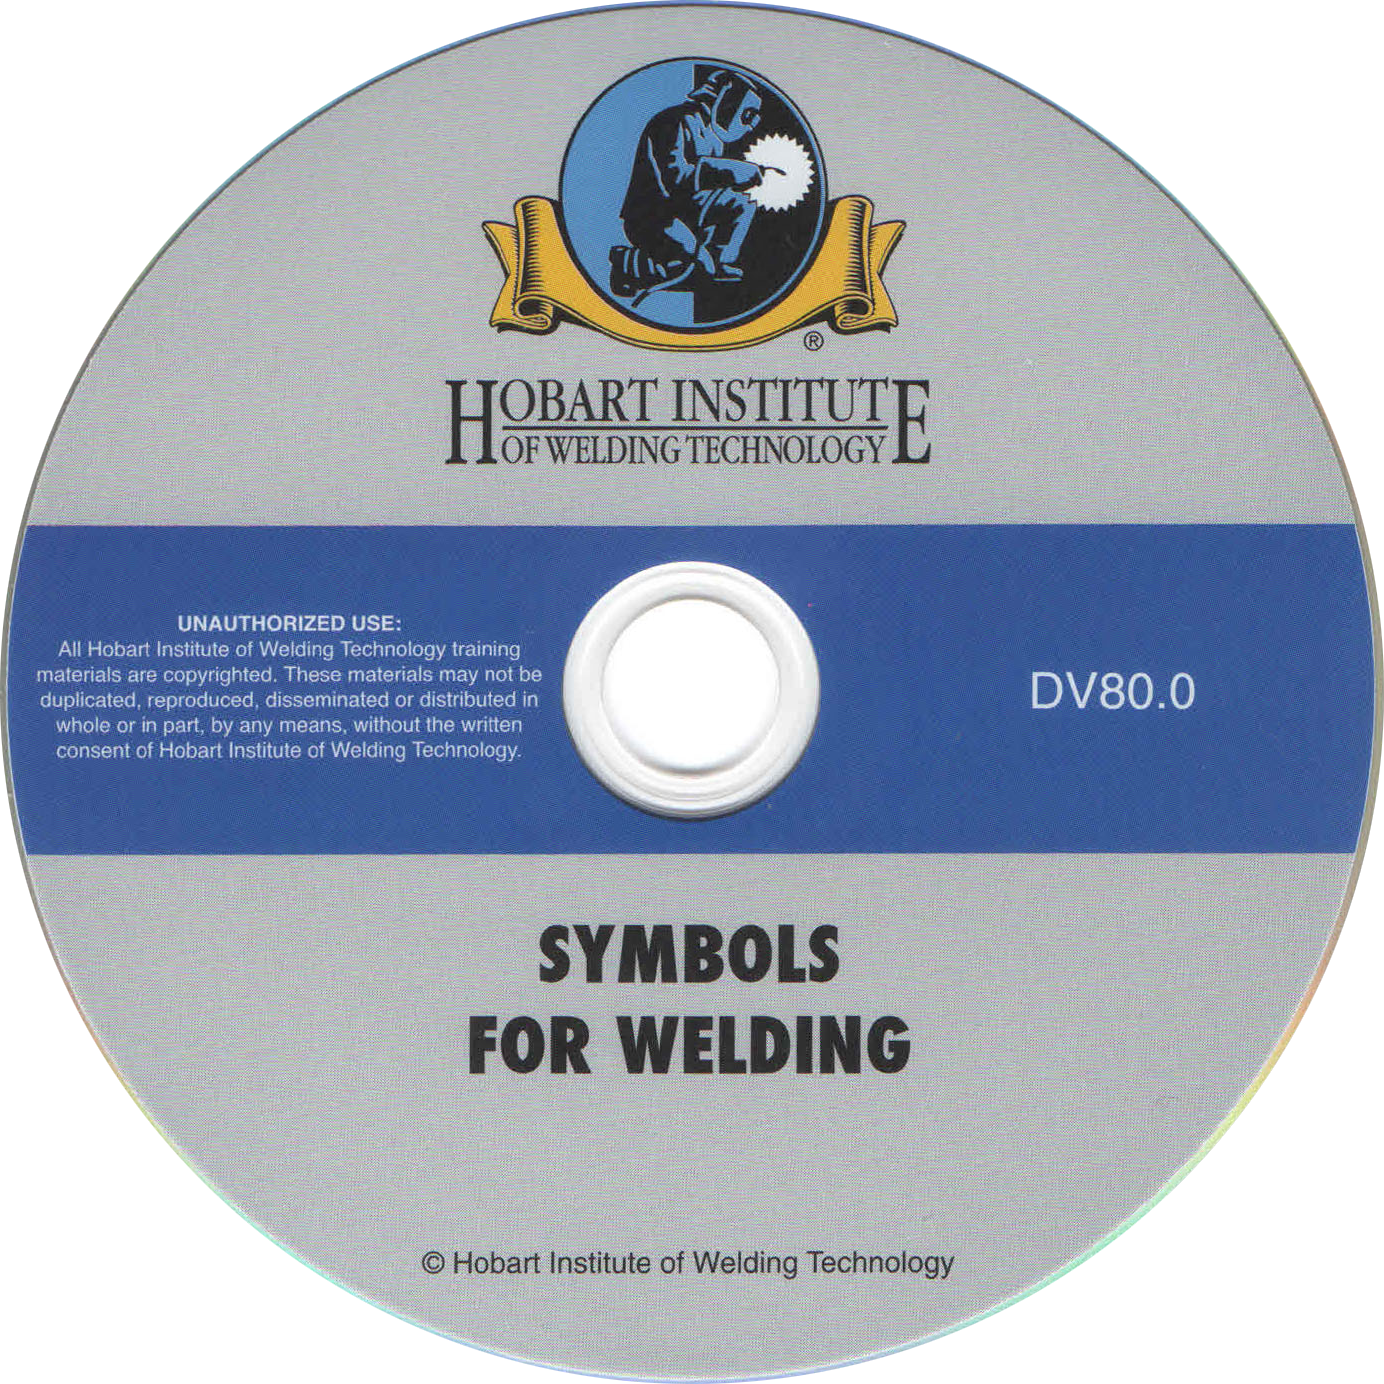 Symbols for welding hobart institute of welding technology symbols for welding biocorpaavc Images